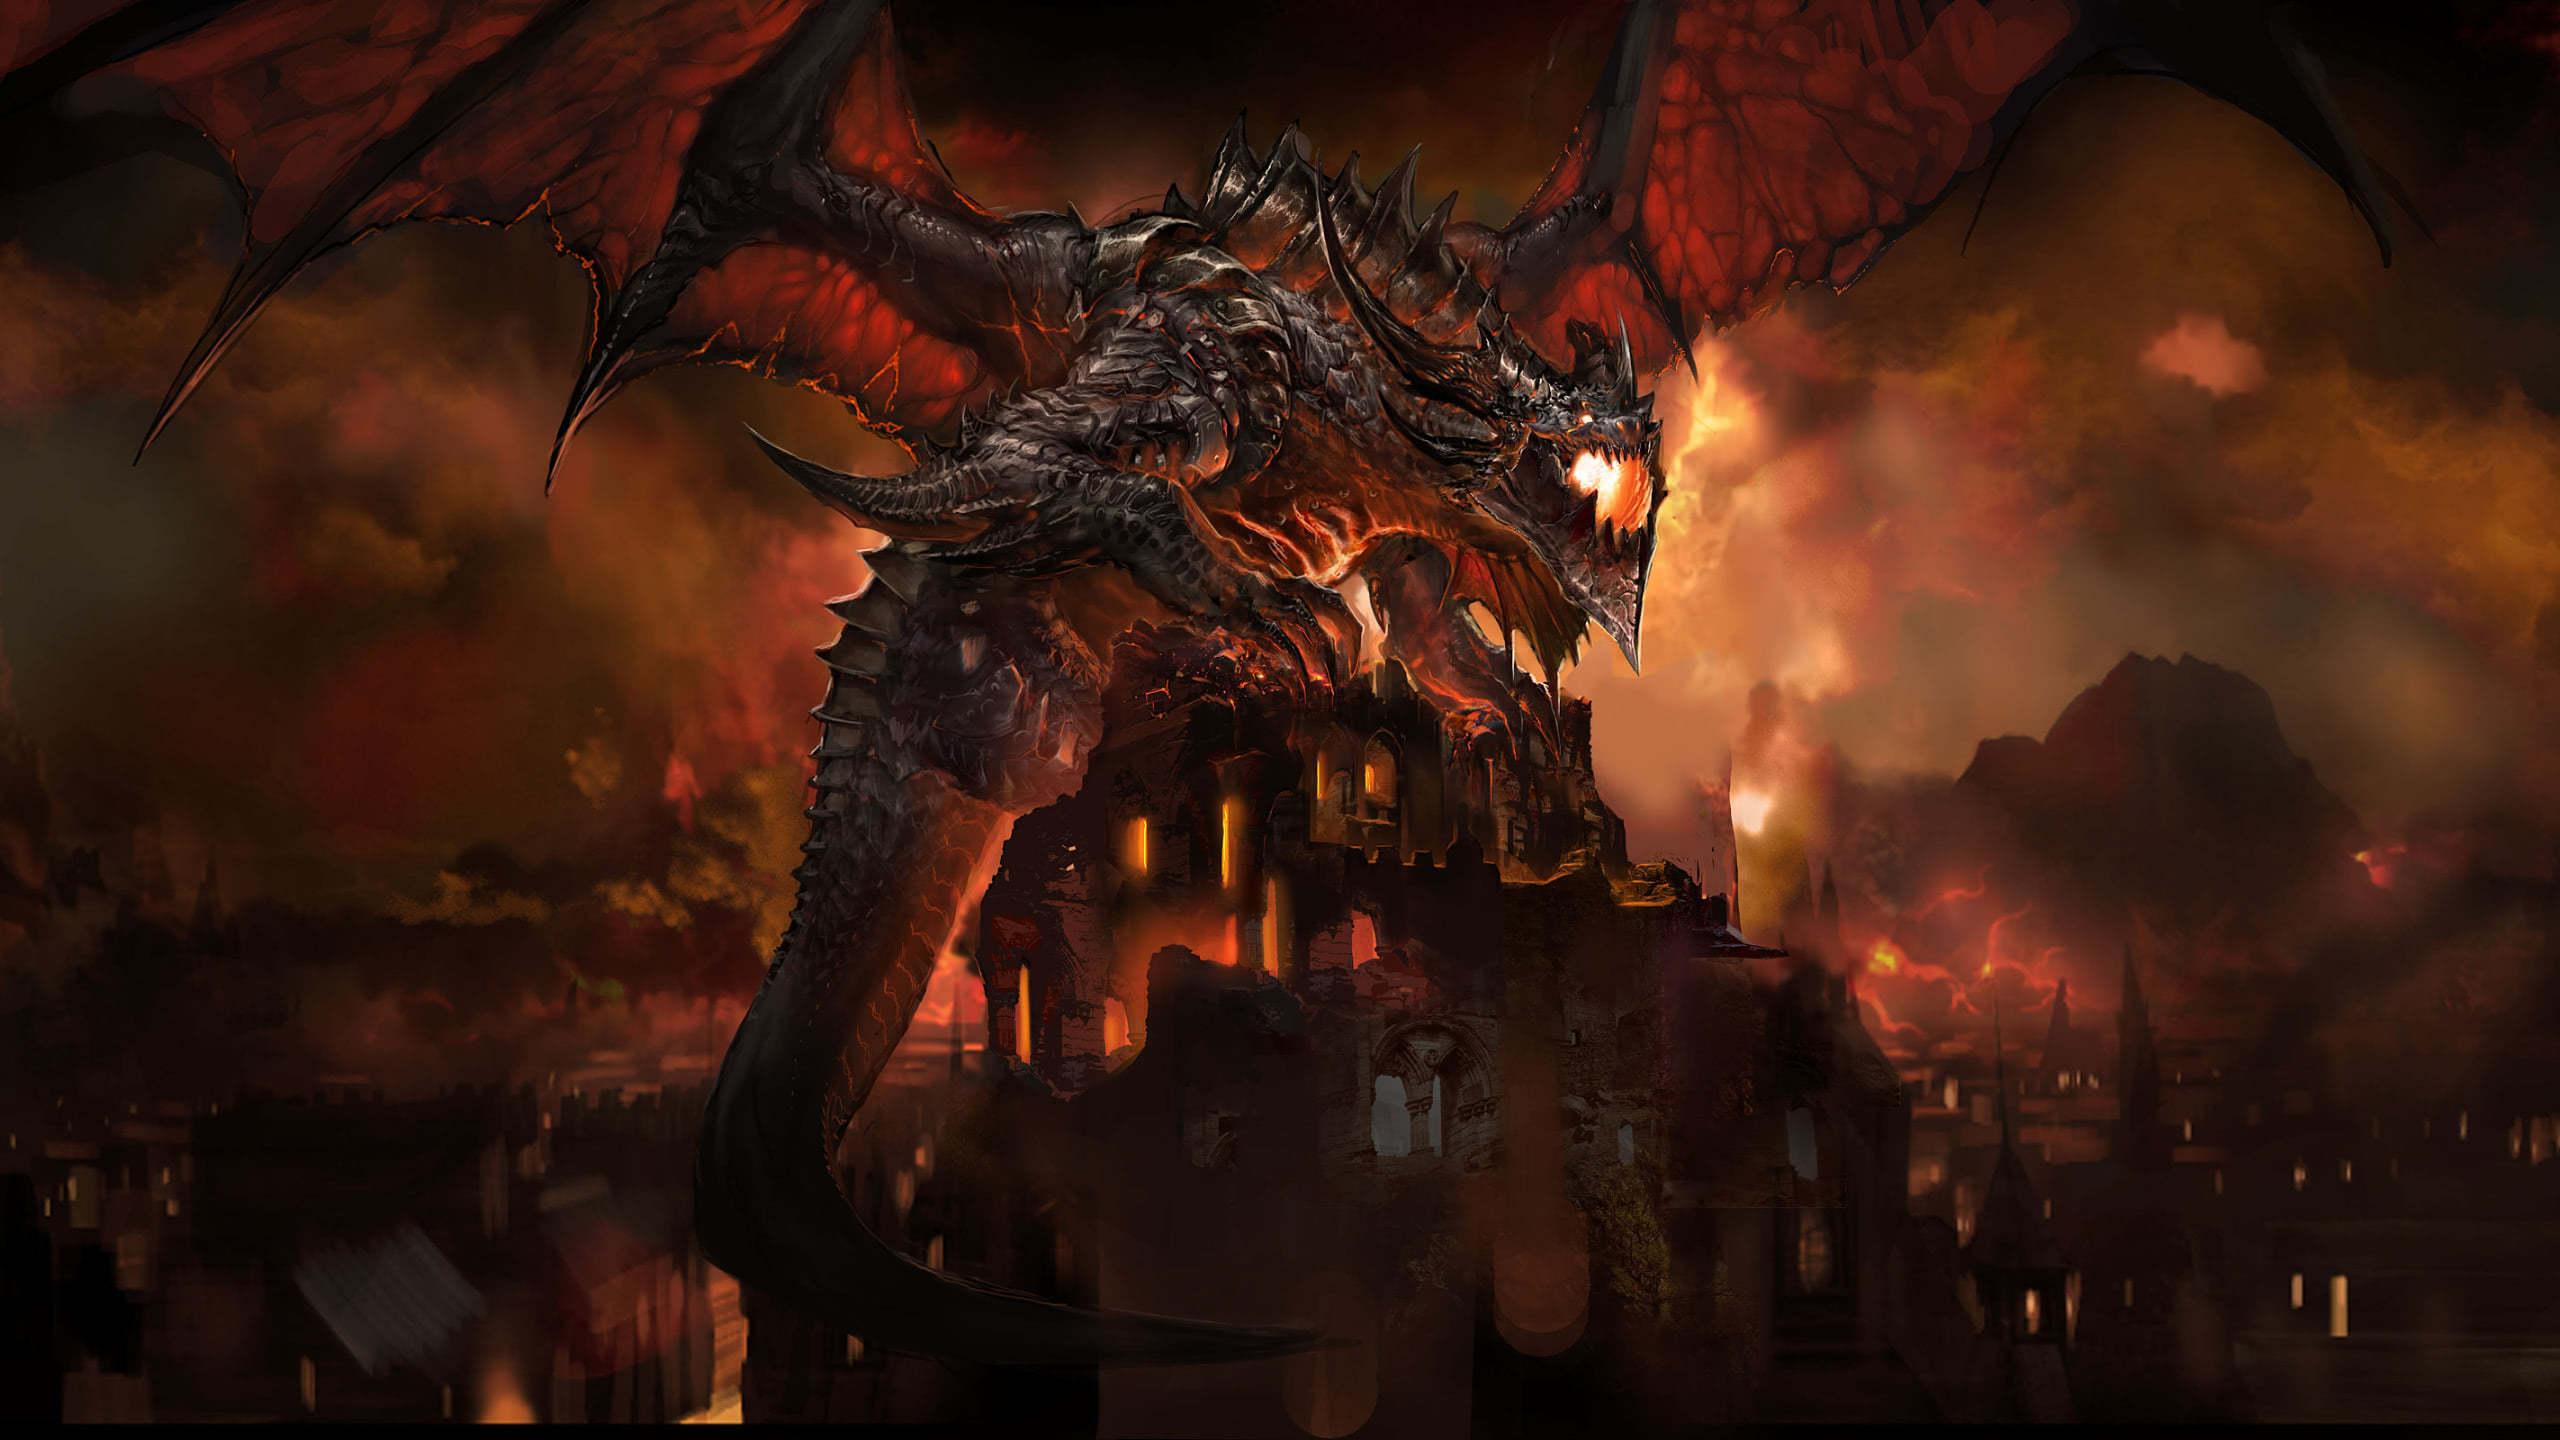 world of warcraft cataclysm deathwing wqhd 1440p wallpaper